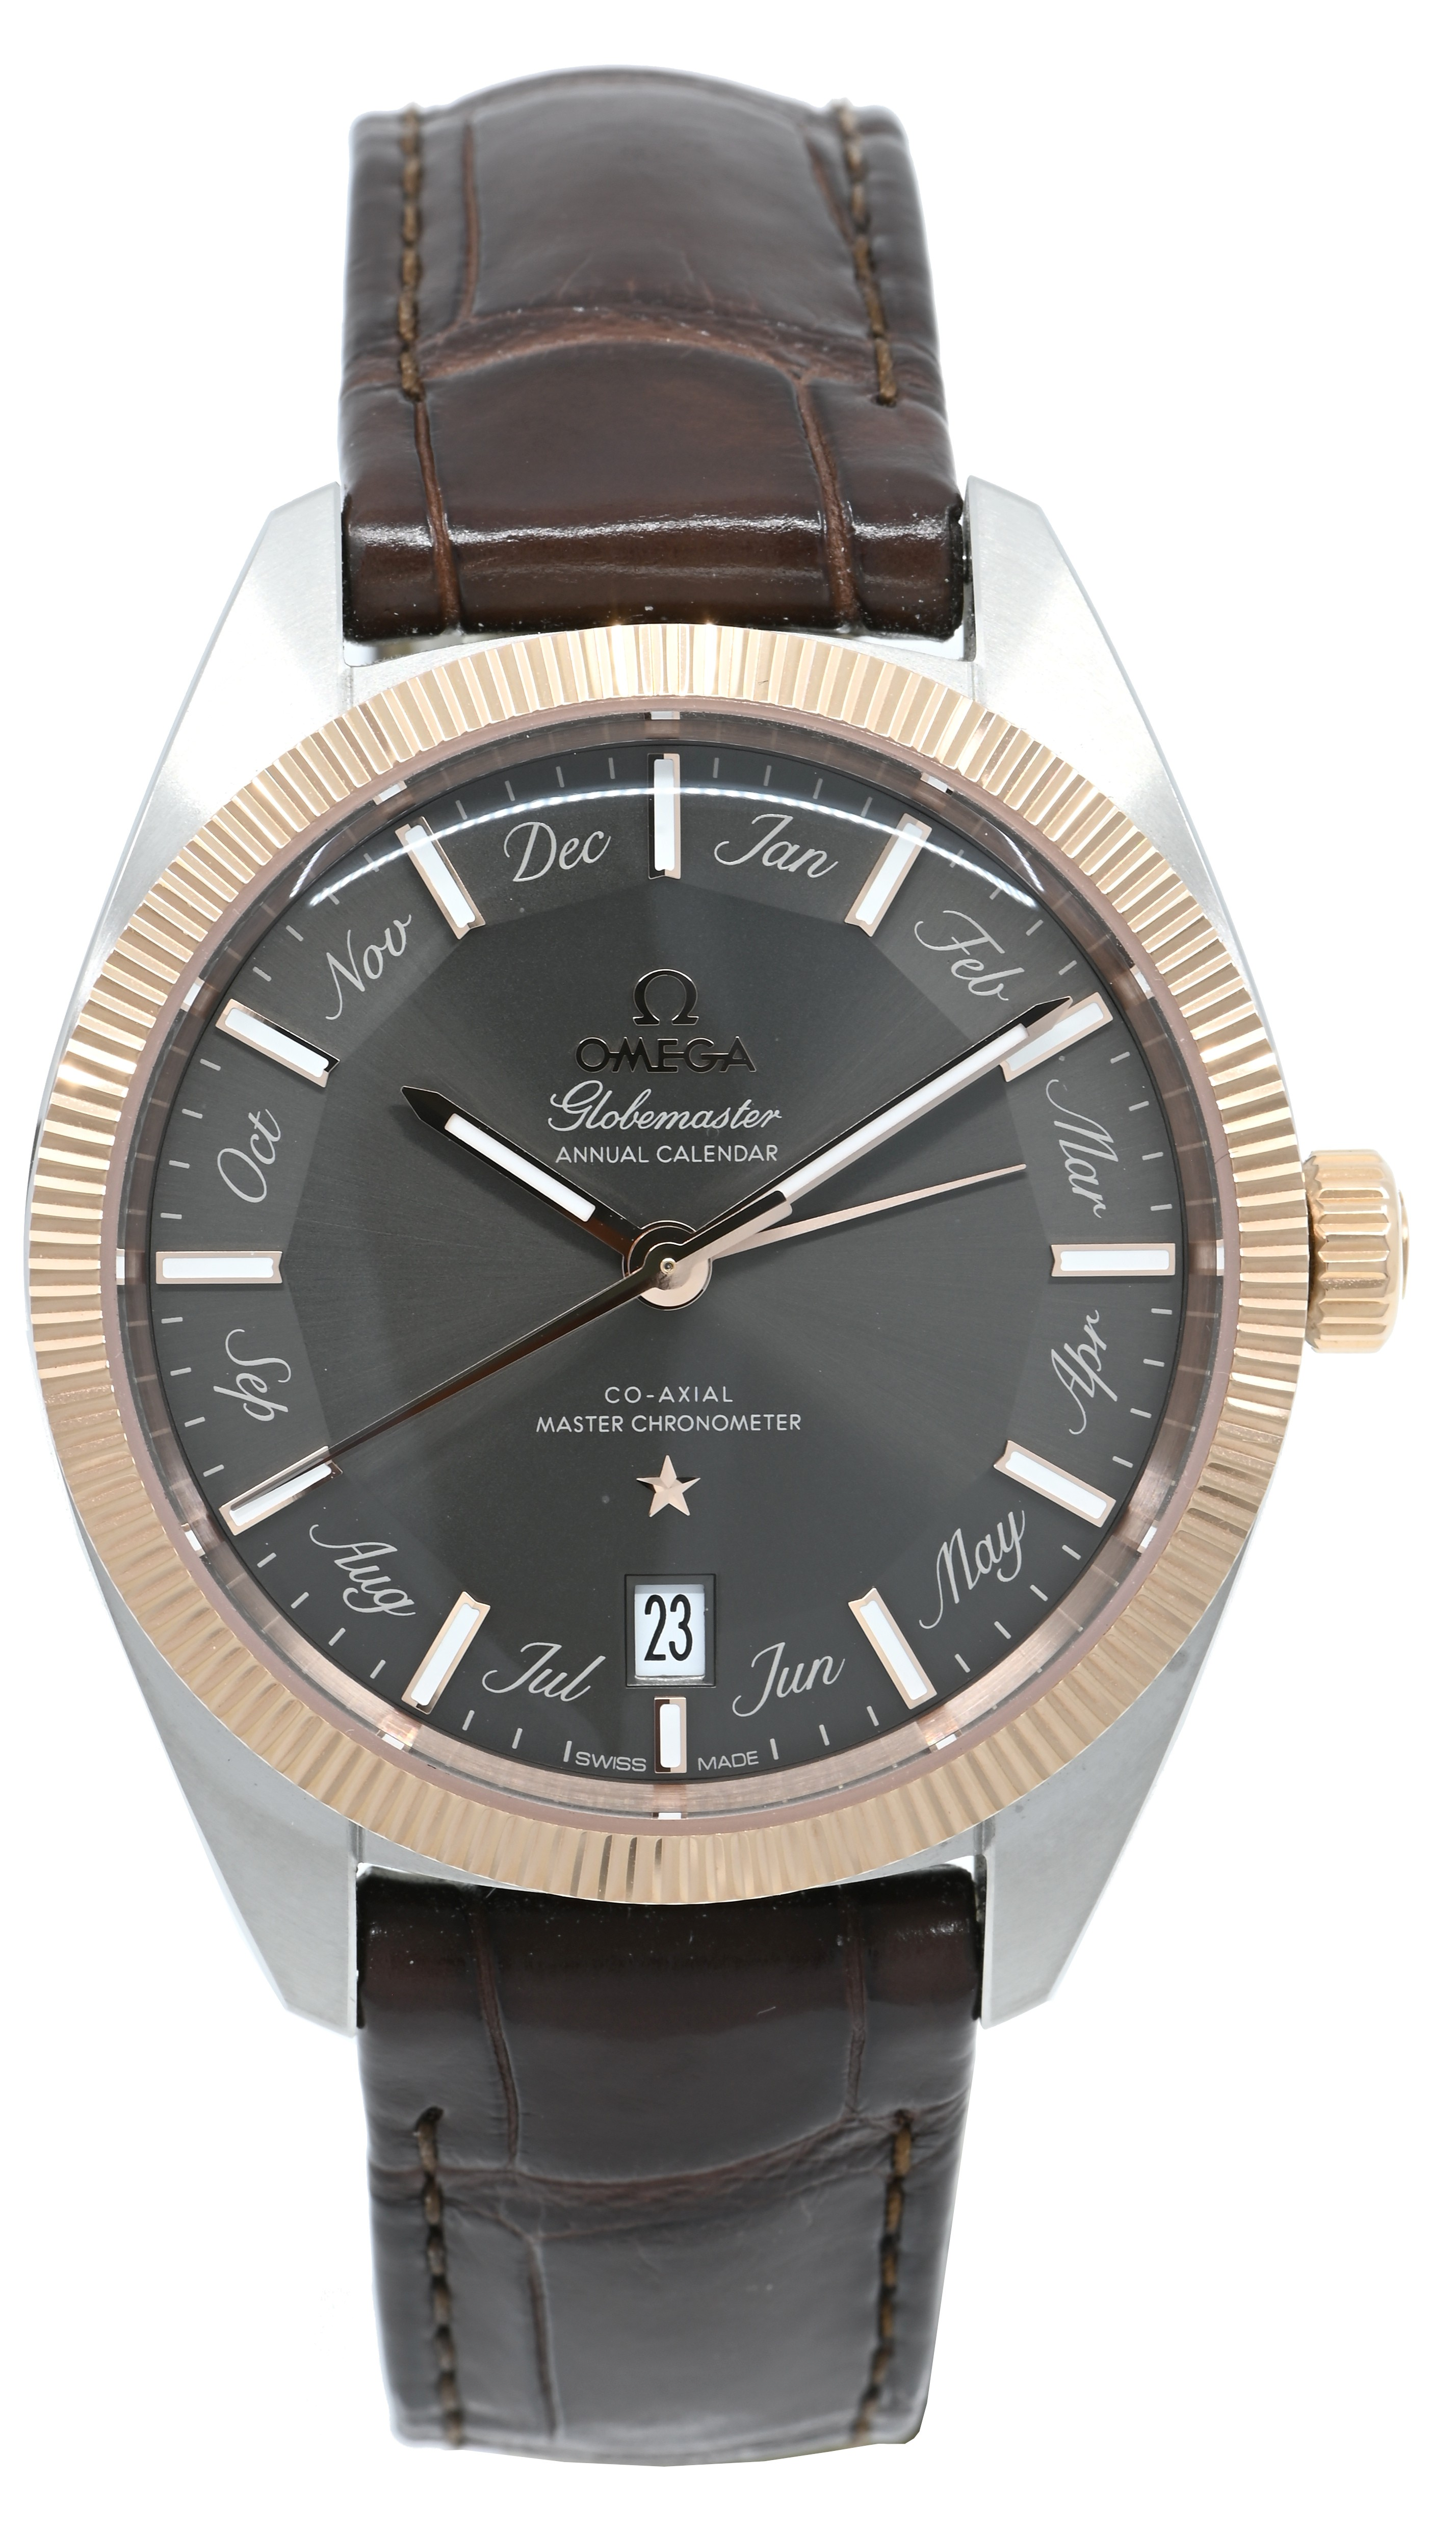 globemaster-omega-co-axial-master-chronometre-calendrier-annuel-41-mm-1